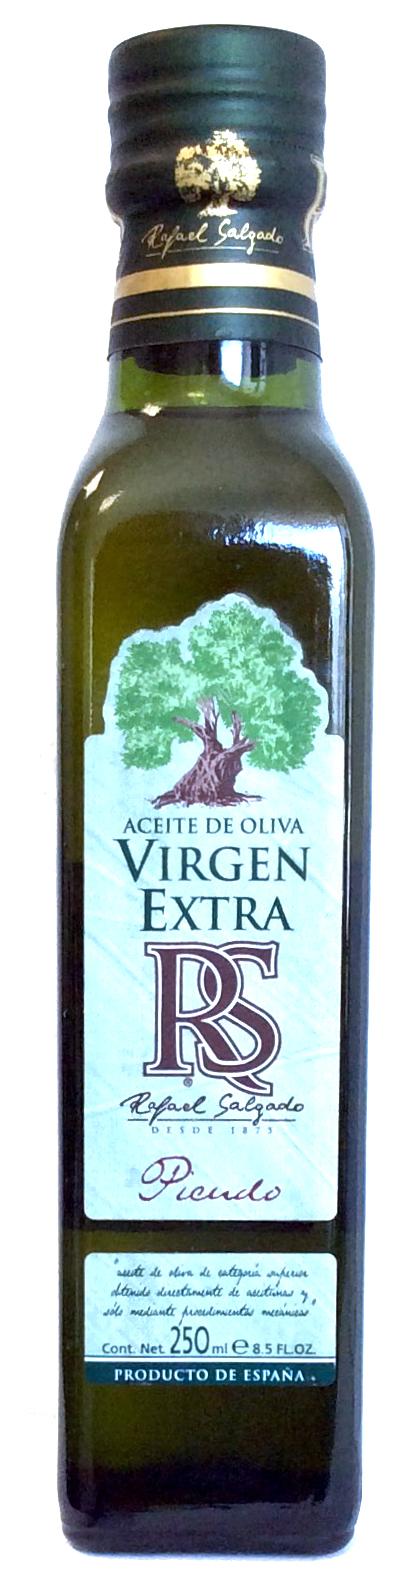 Aceite de Oliva Virgen Extra varietal Picuda 250 ml